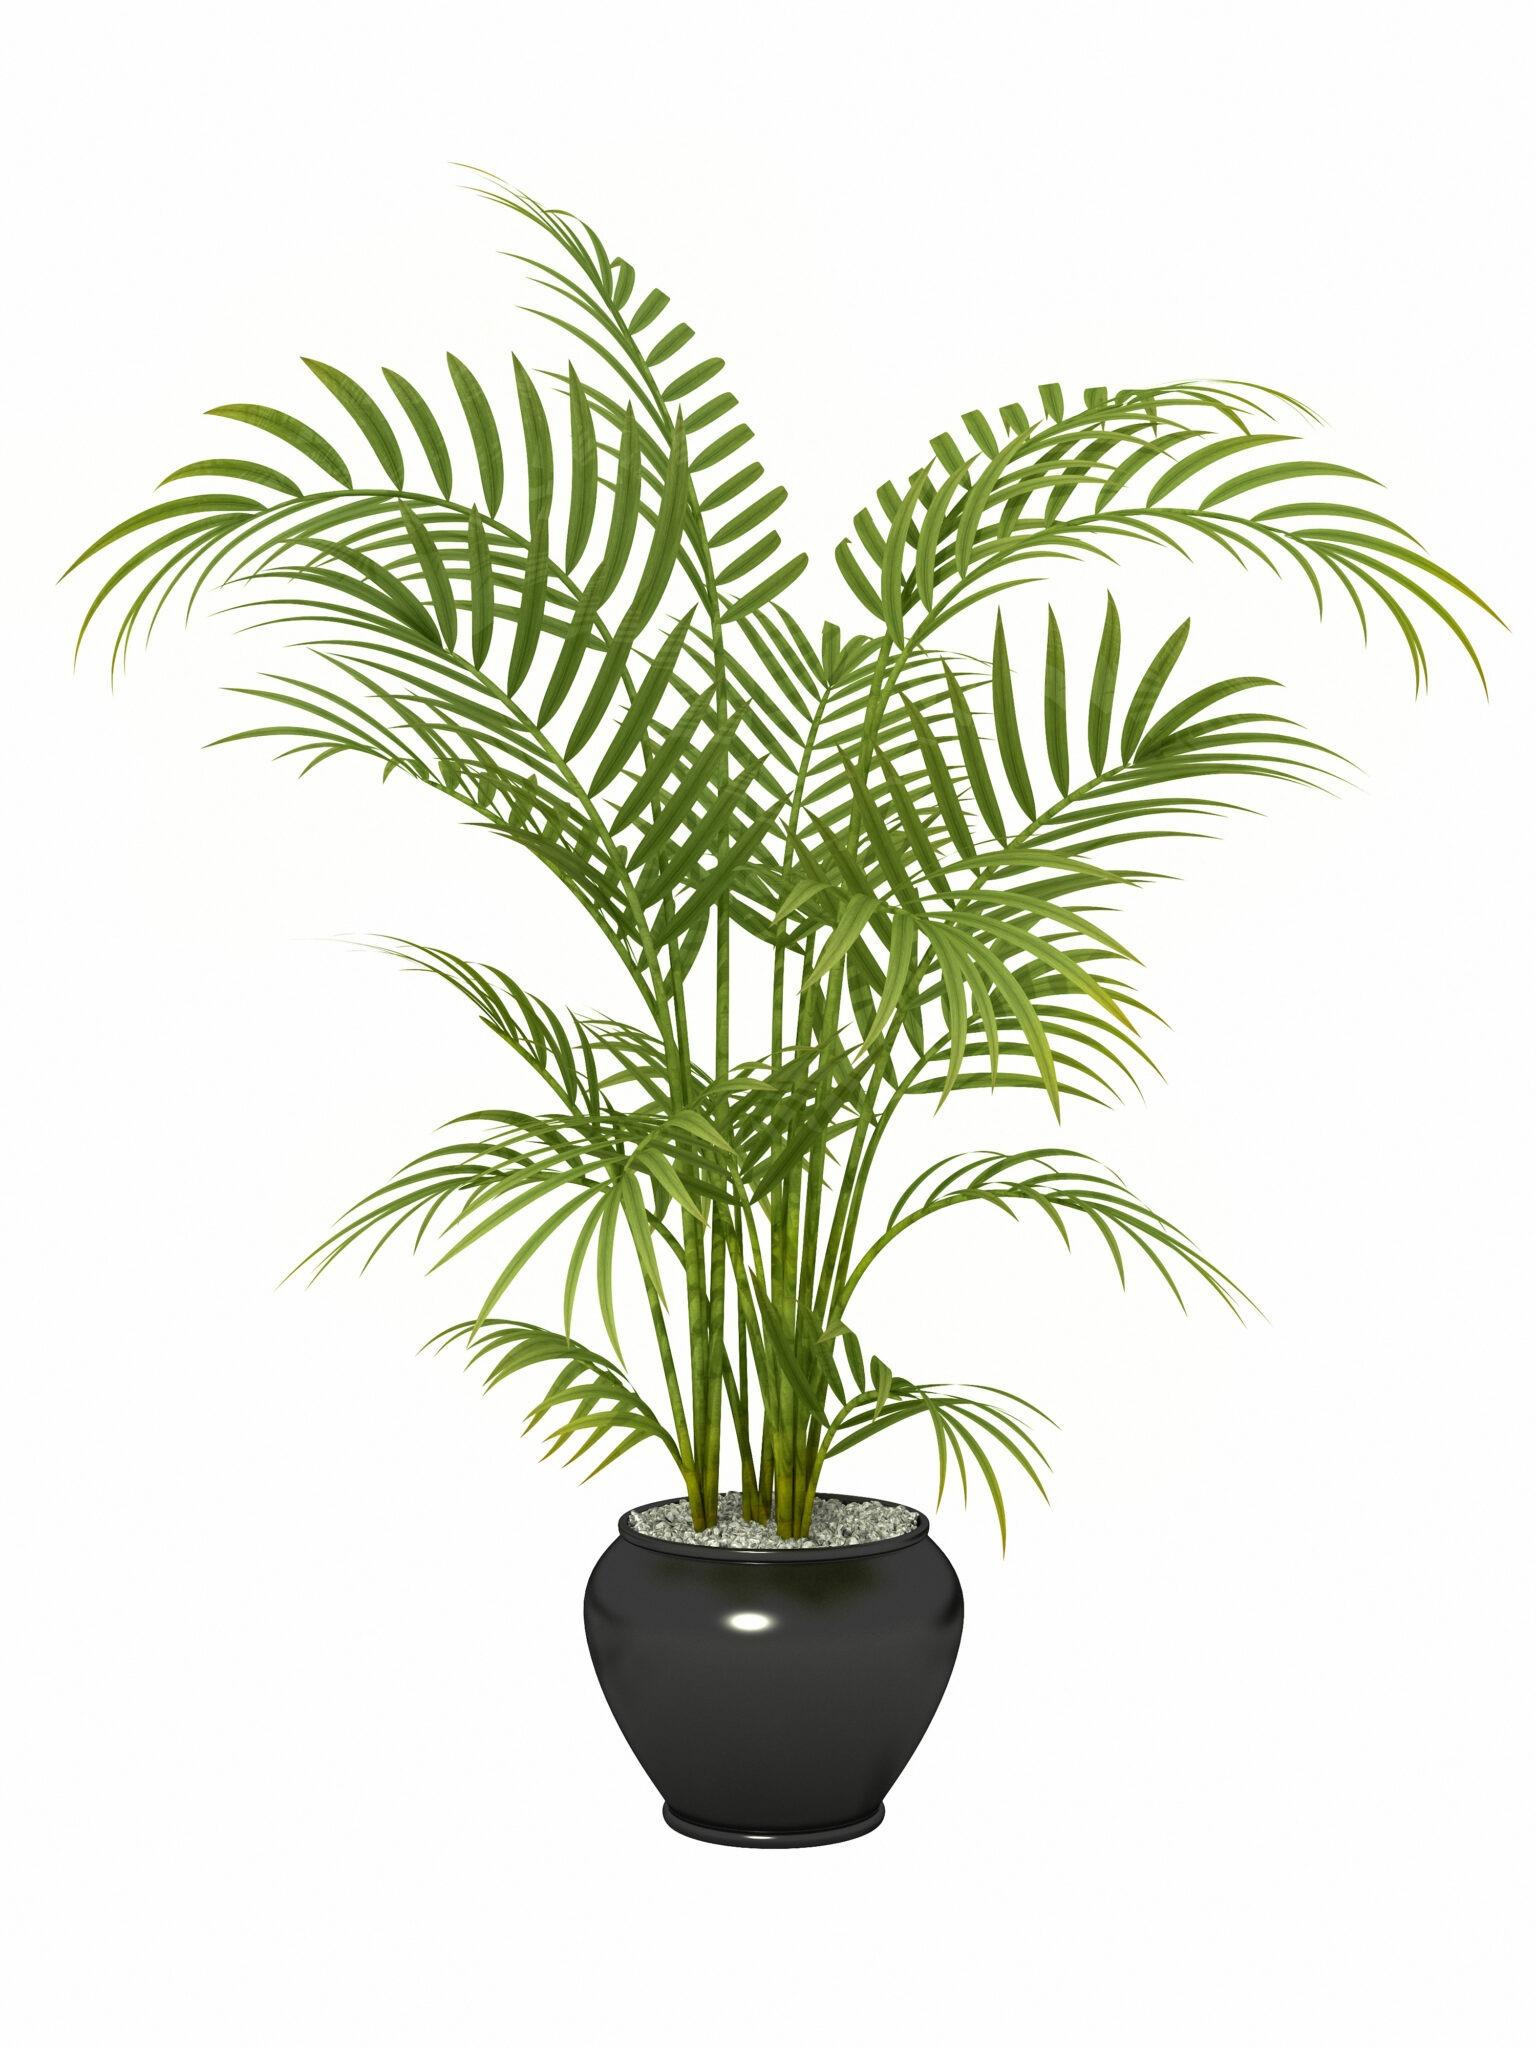 Areca Palm Air Purifying Plant And Health Benefits Foodthesiscom